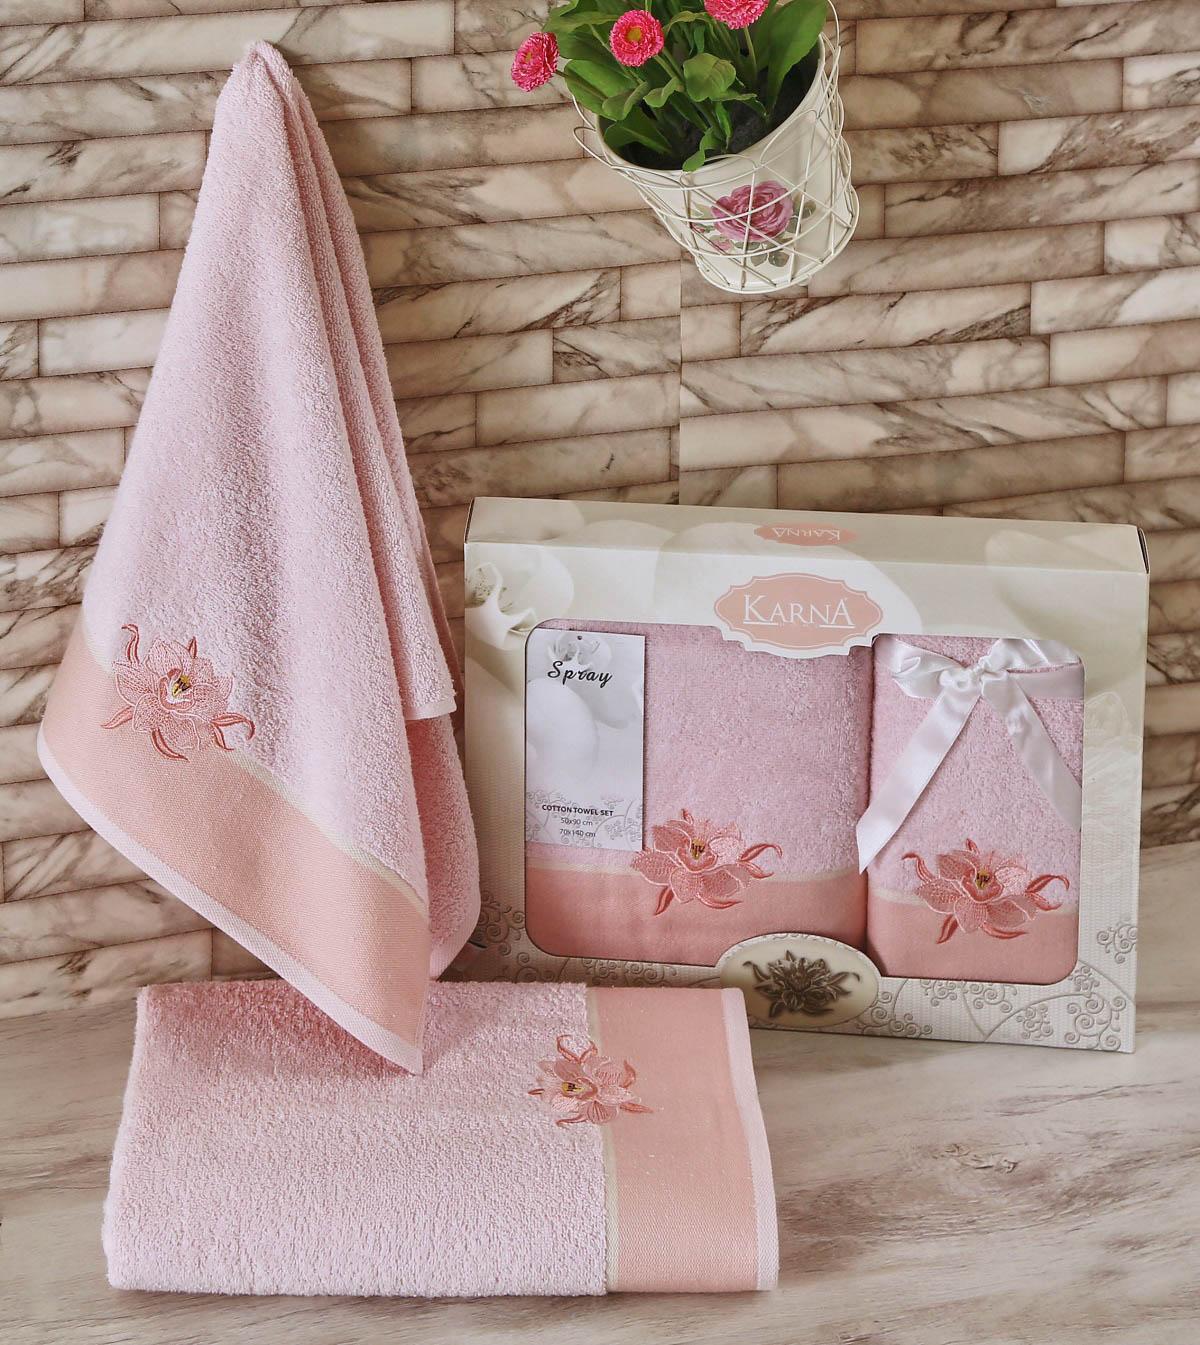 Полотенца Karna Полотенце Spray Цвет: Светло-Розовый (Набор)